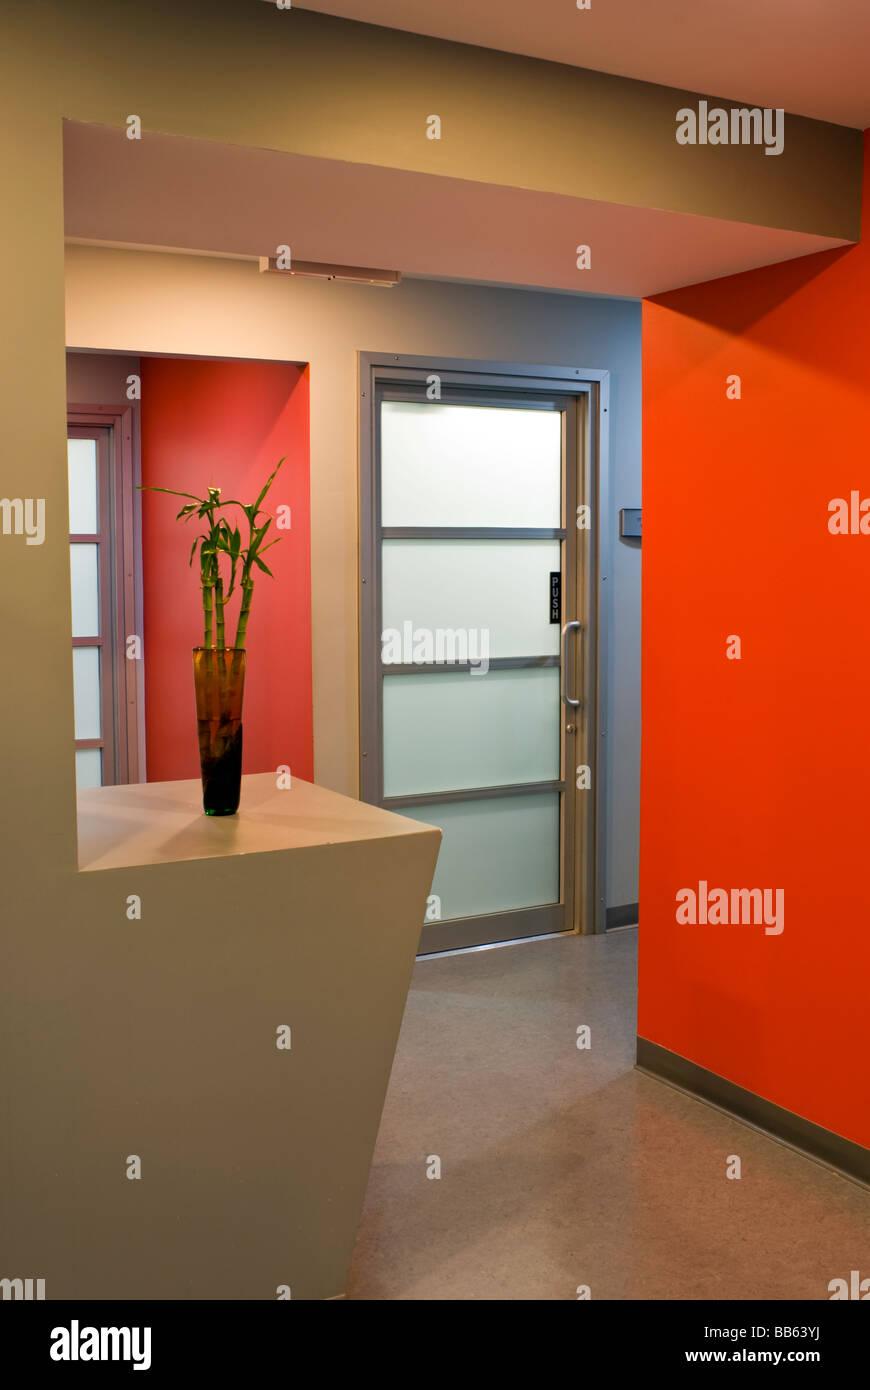 office lobby designs cool office lobby interior in harlem new york city craig m eisenberg